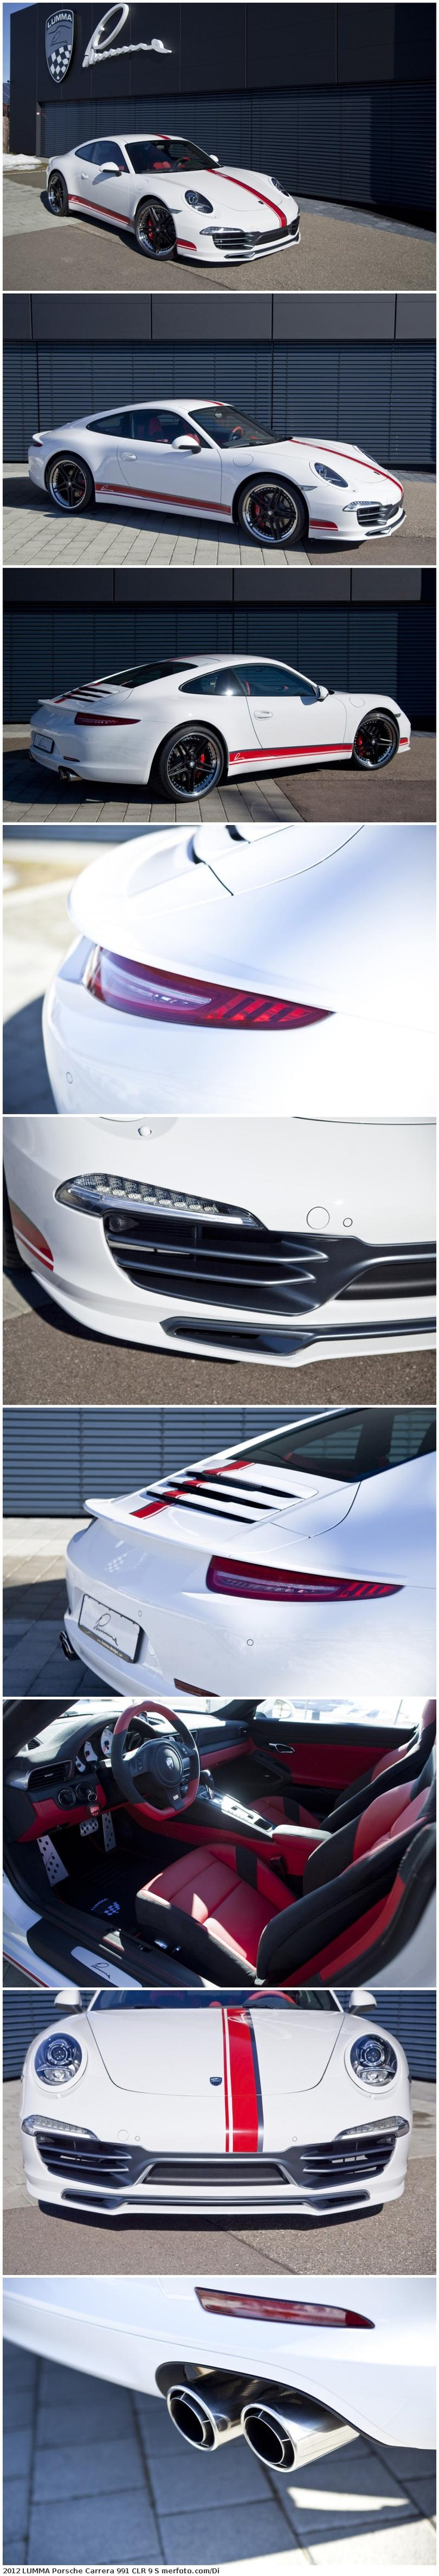 2012 LUMMA Porsche Carrera 991 CLR 9 S- Saw this today minus racing stripe and OMG amazing!!!